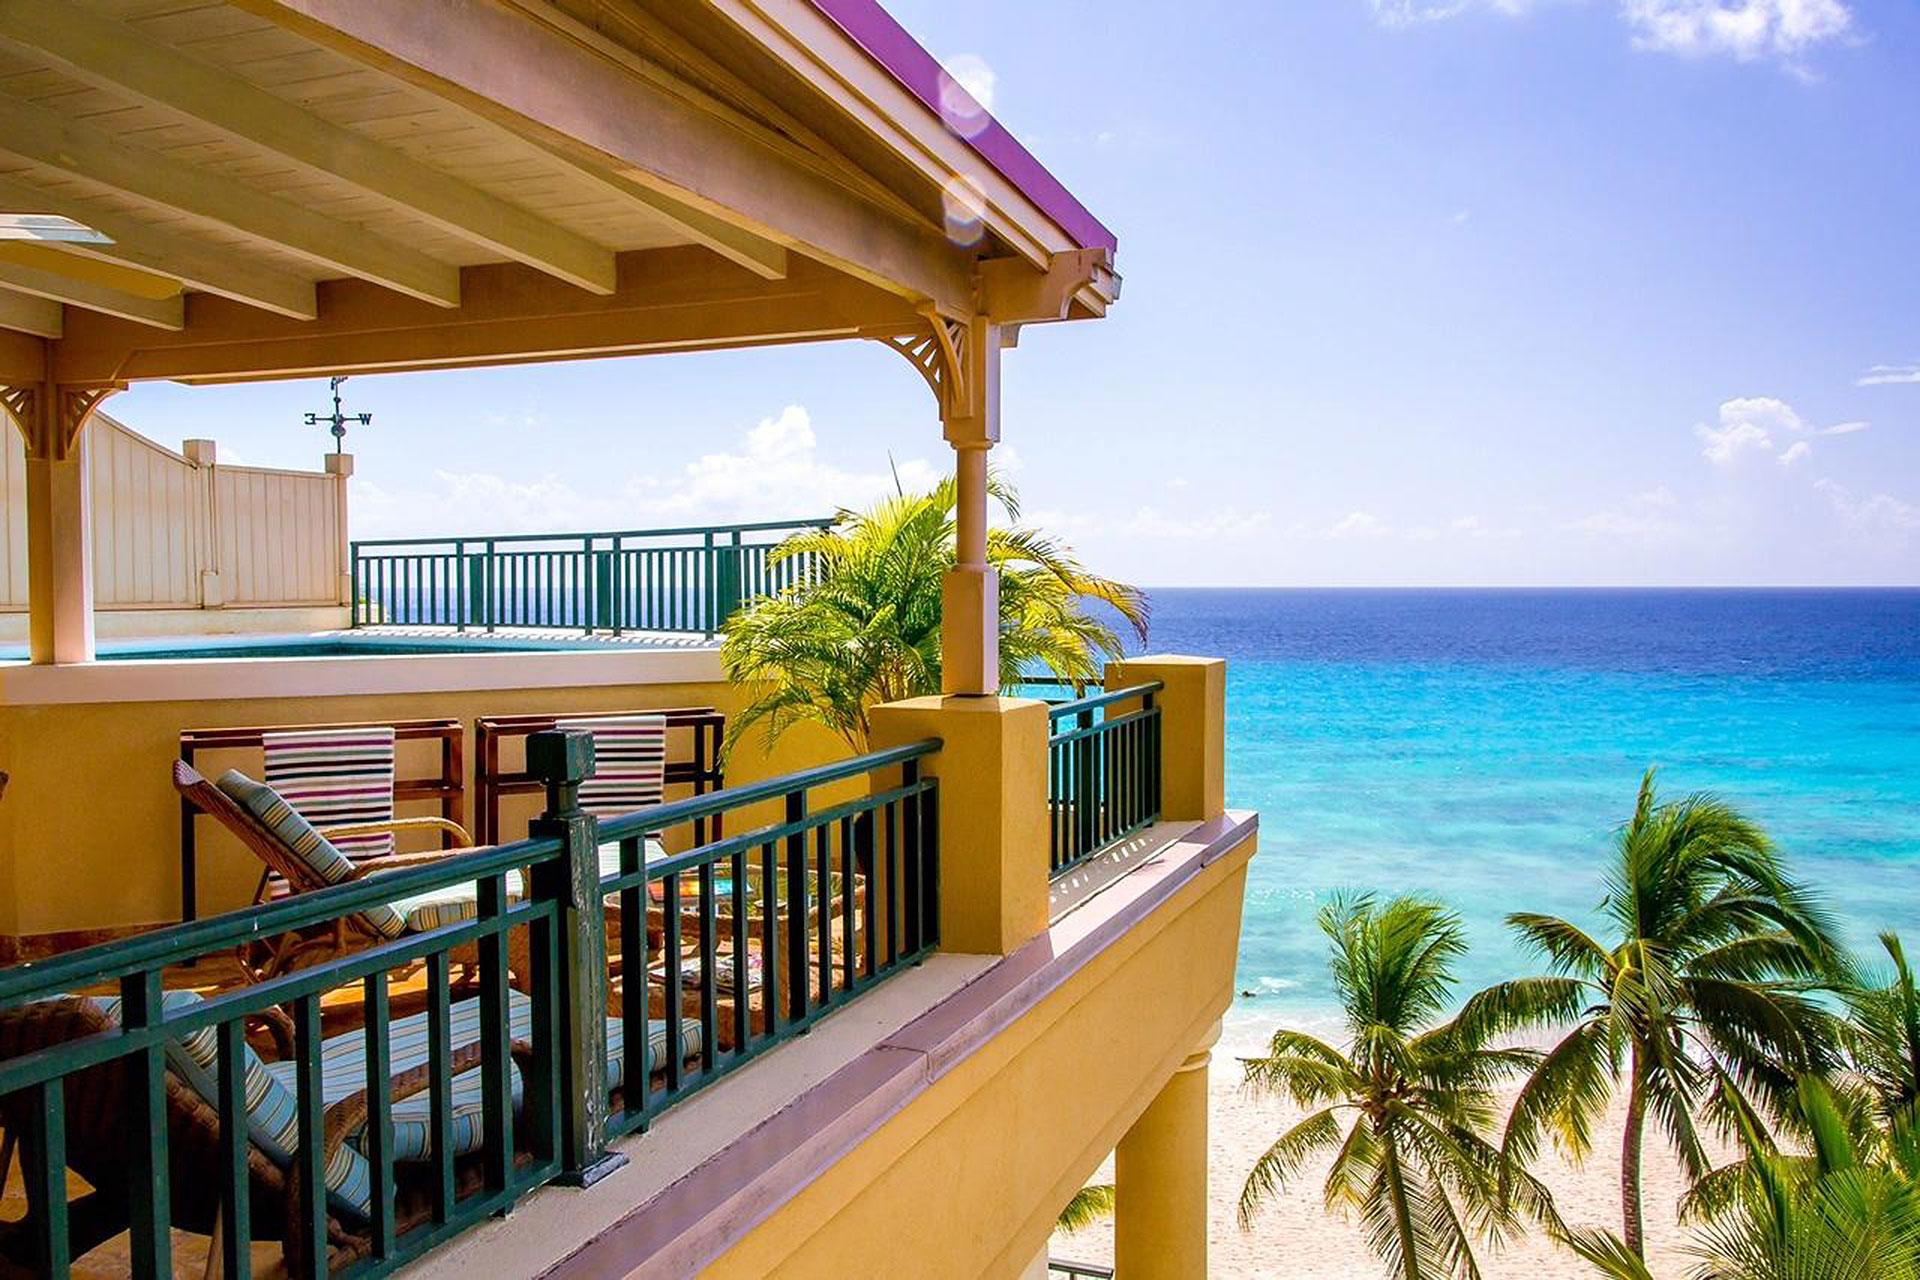 Villa at White Sands Beach Condos; Courtesy of White Sands Beach Condos